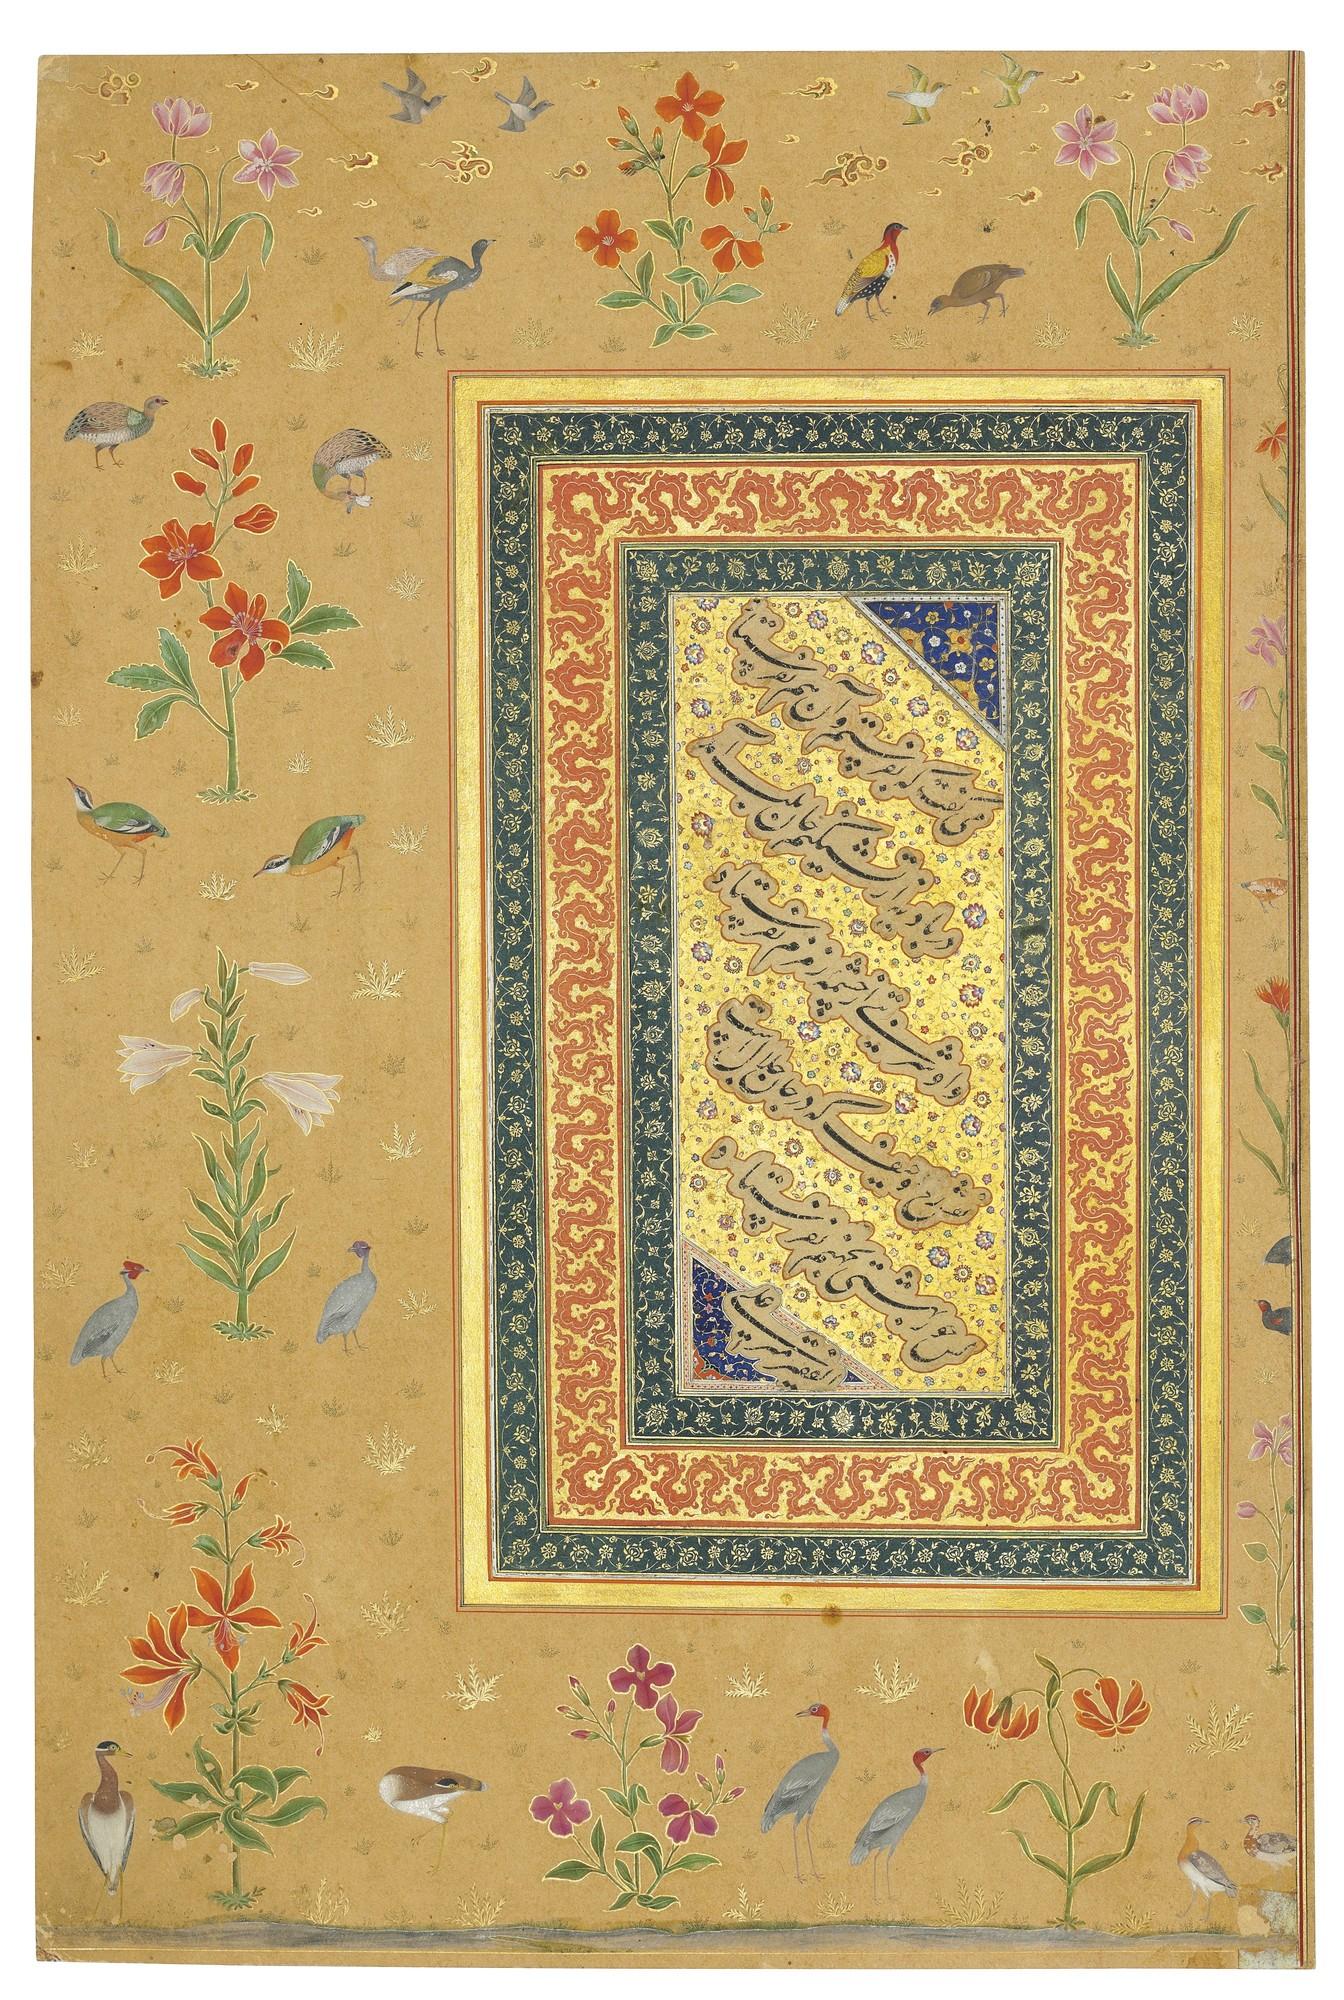 CIRCA 1650-58 folio 15 x 9¾in. (38.2 x 24.8cm.) £70,000-100,000